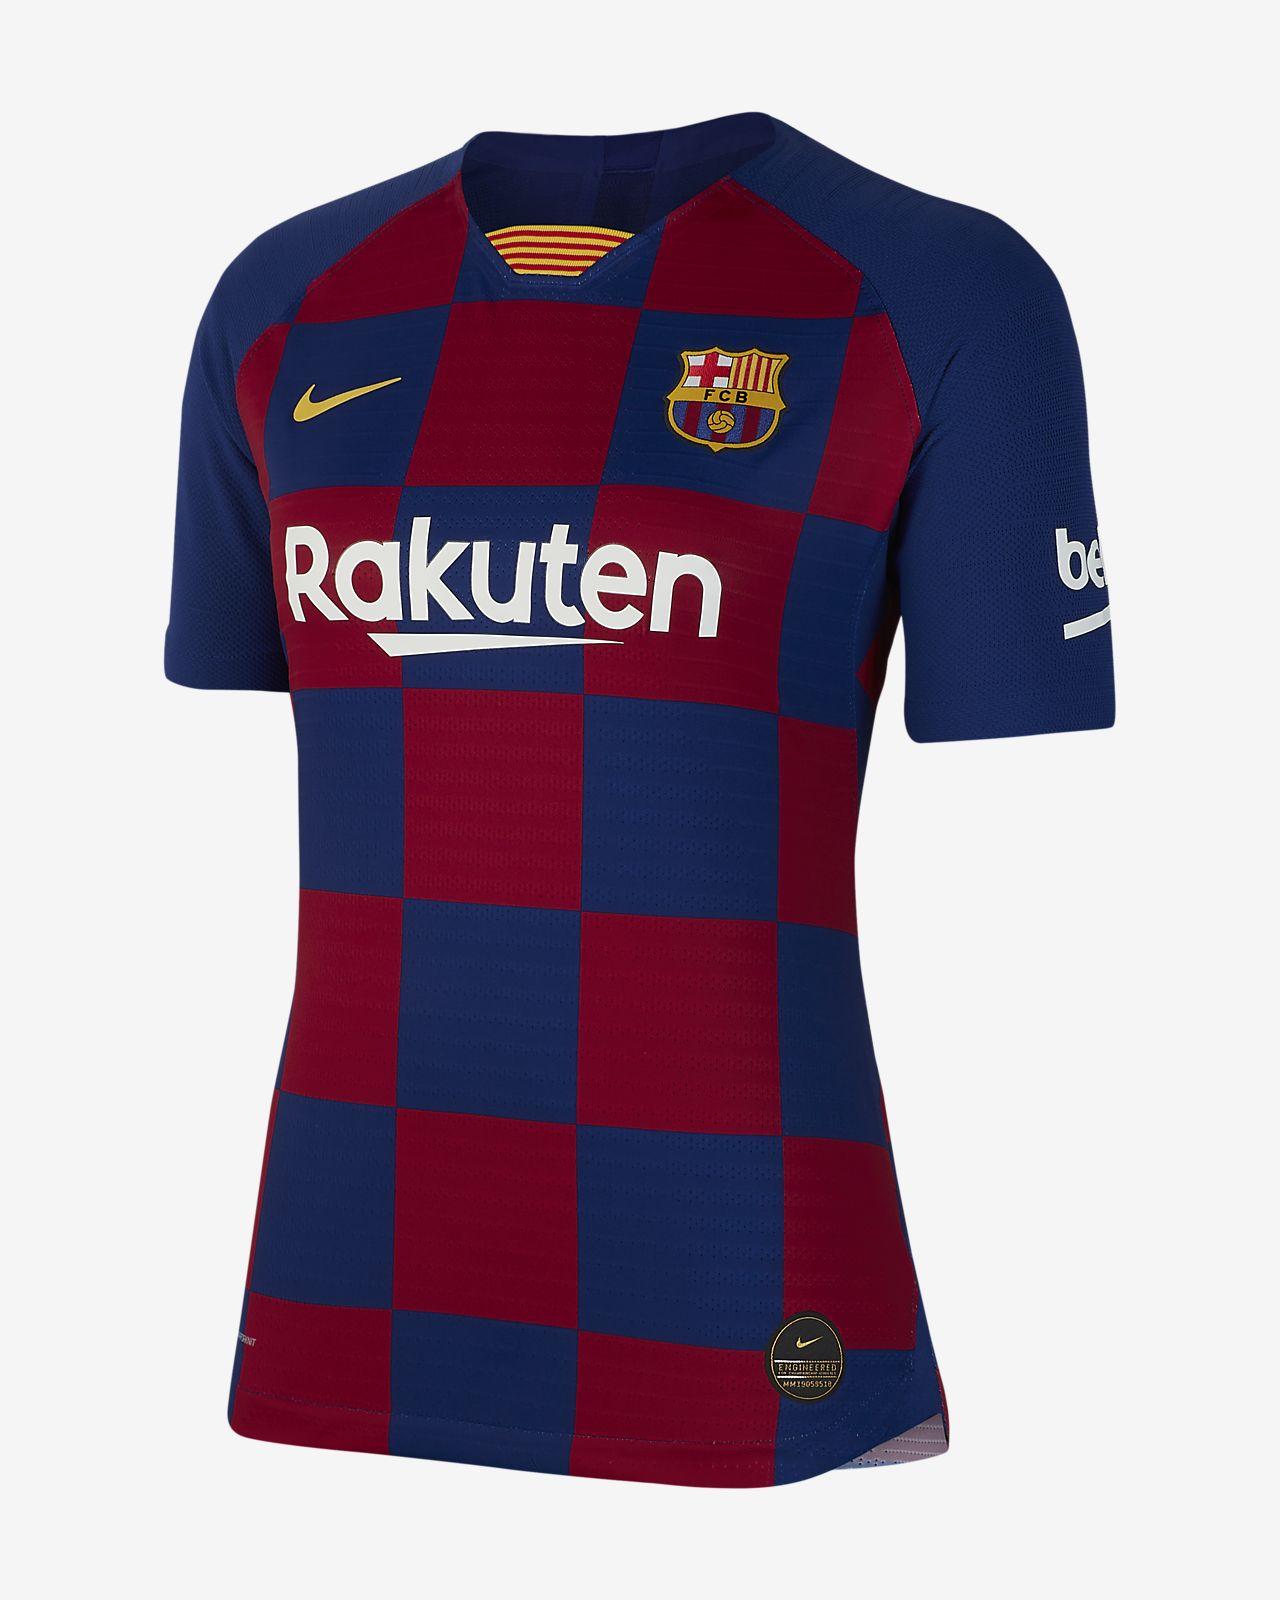 cfe6d927 ... Camiseta de fútbol de local para mujer Vapor Match del FC Barcelona 2019 /20